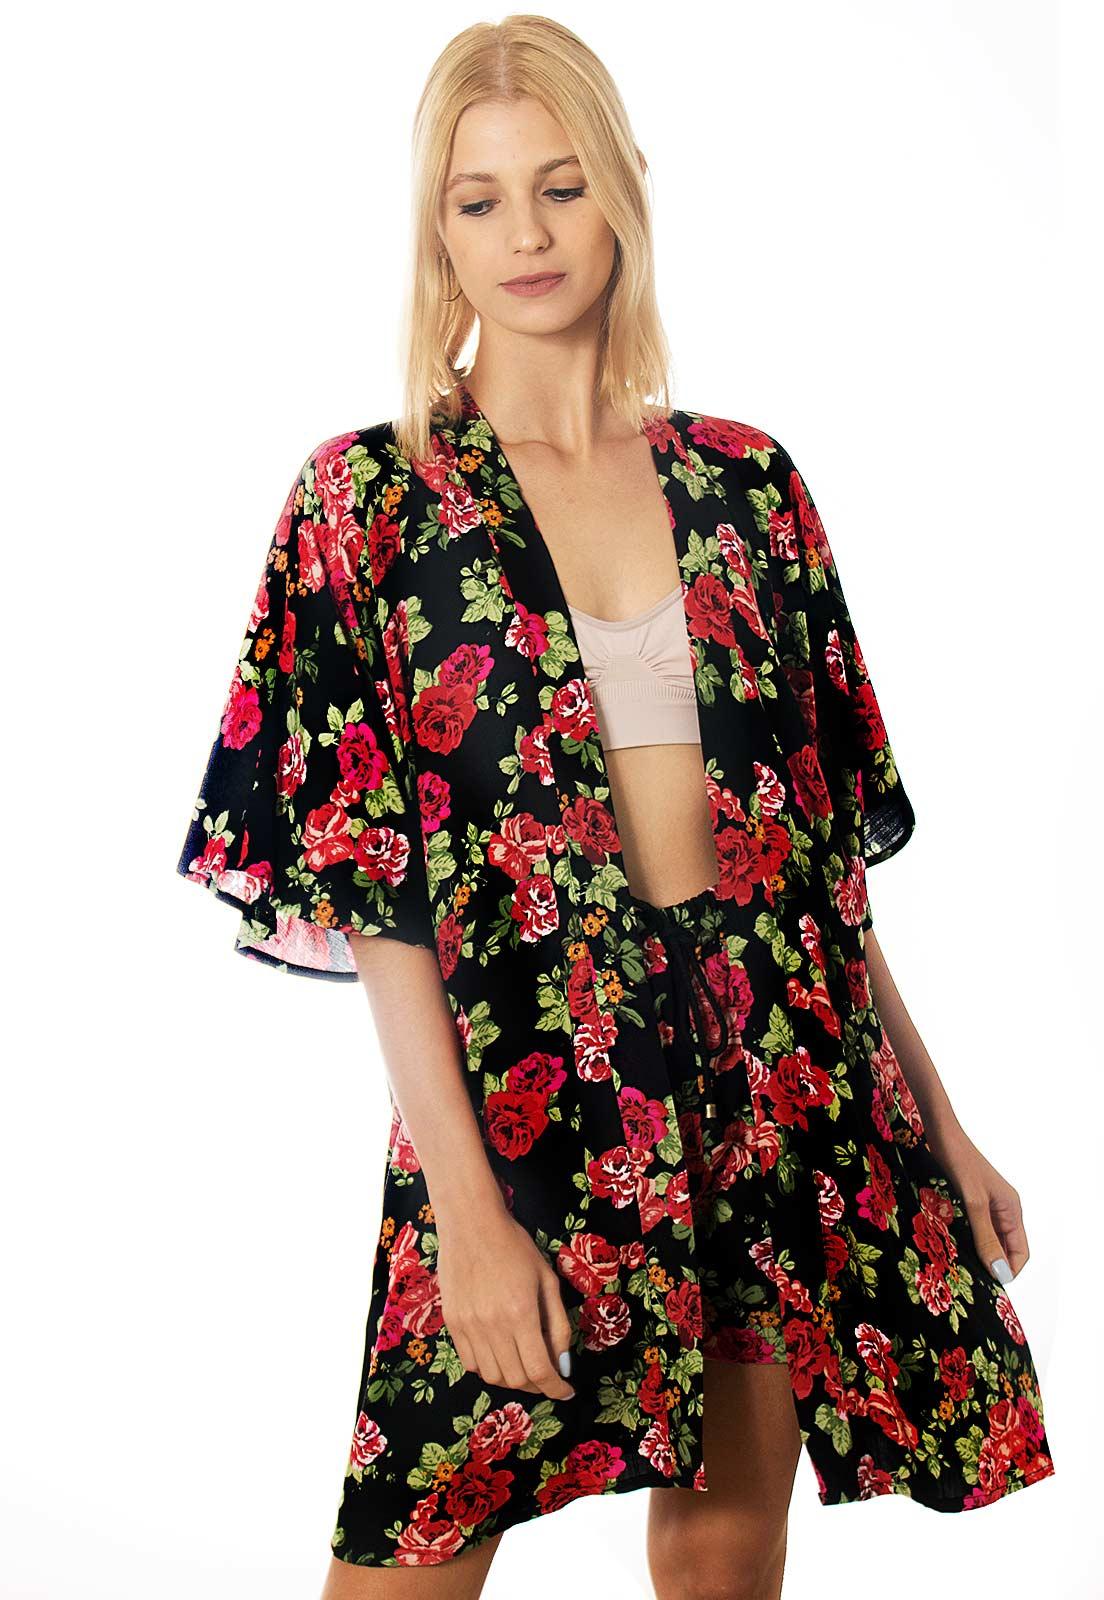 Conjunto Kimono + Shorts Floral Escuro Estampado ElephunK Portland Feminino Masculino Moda Vermelho